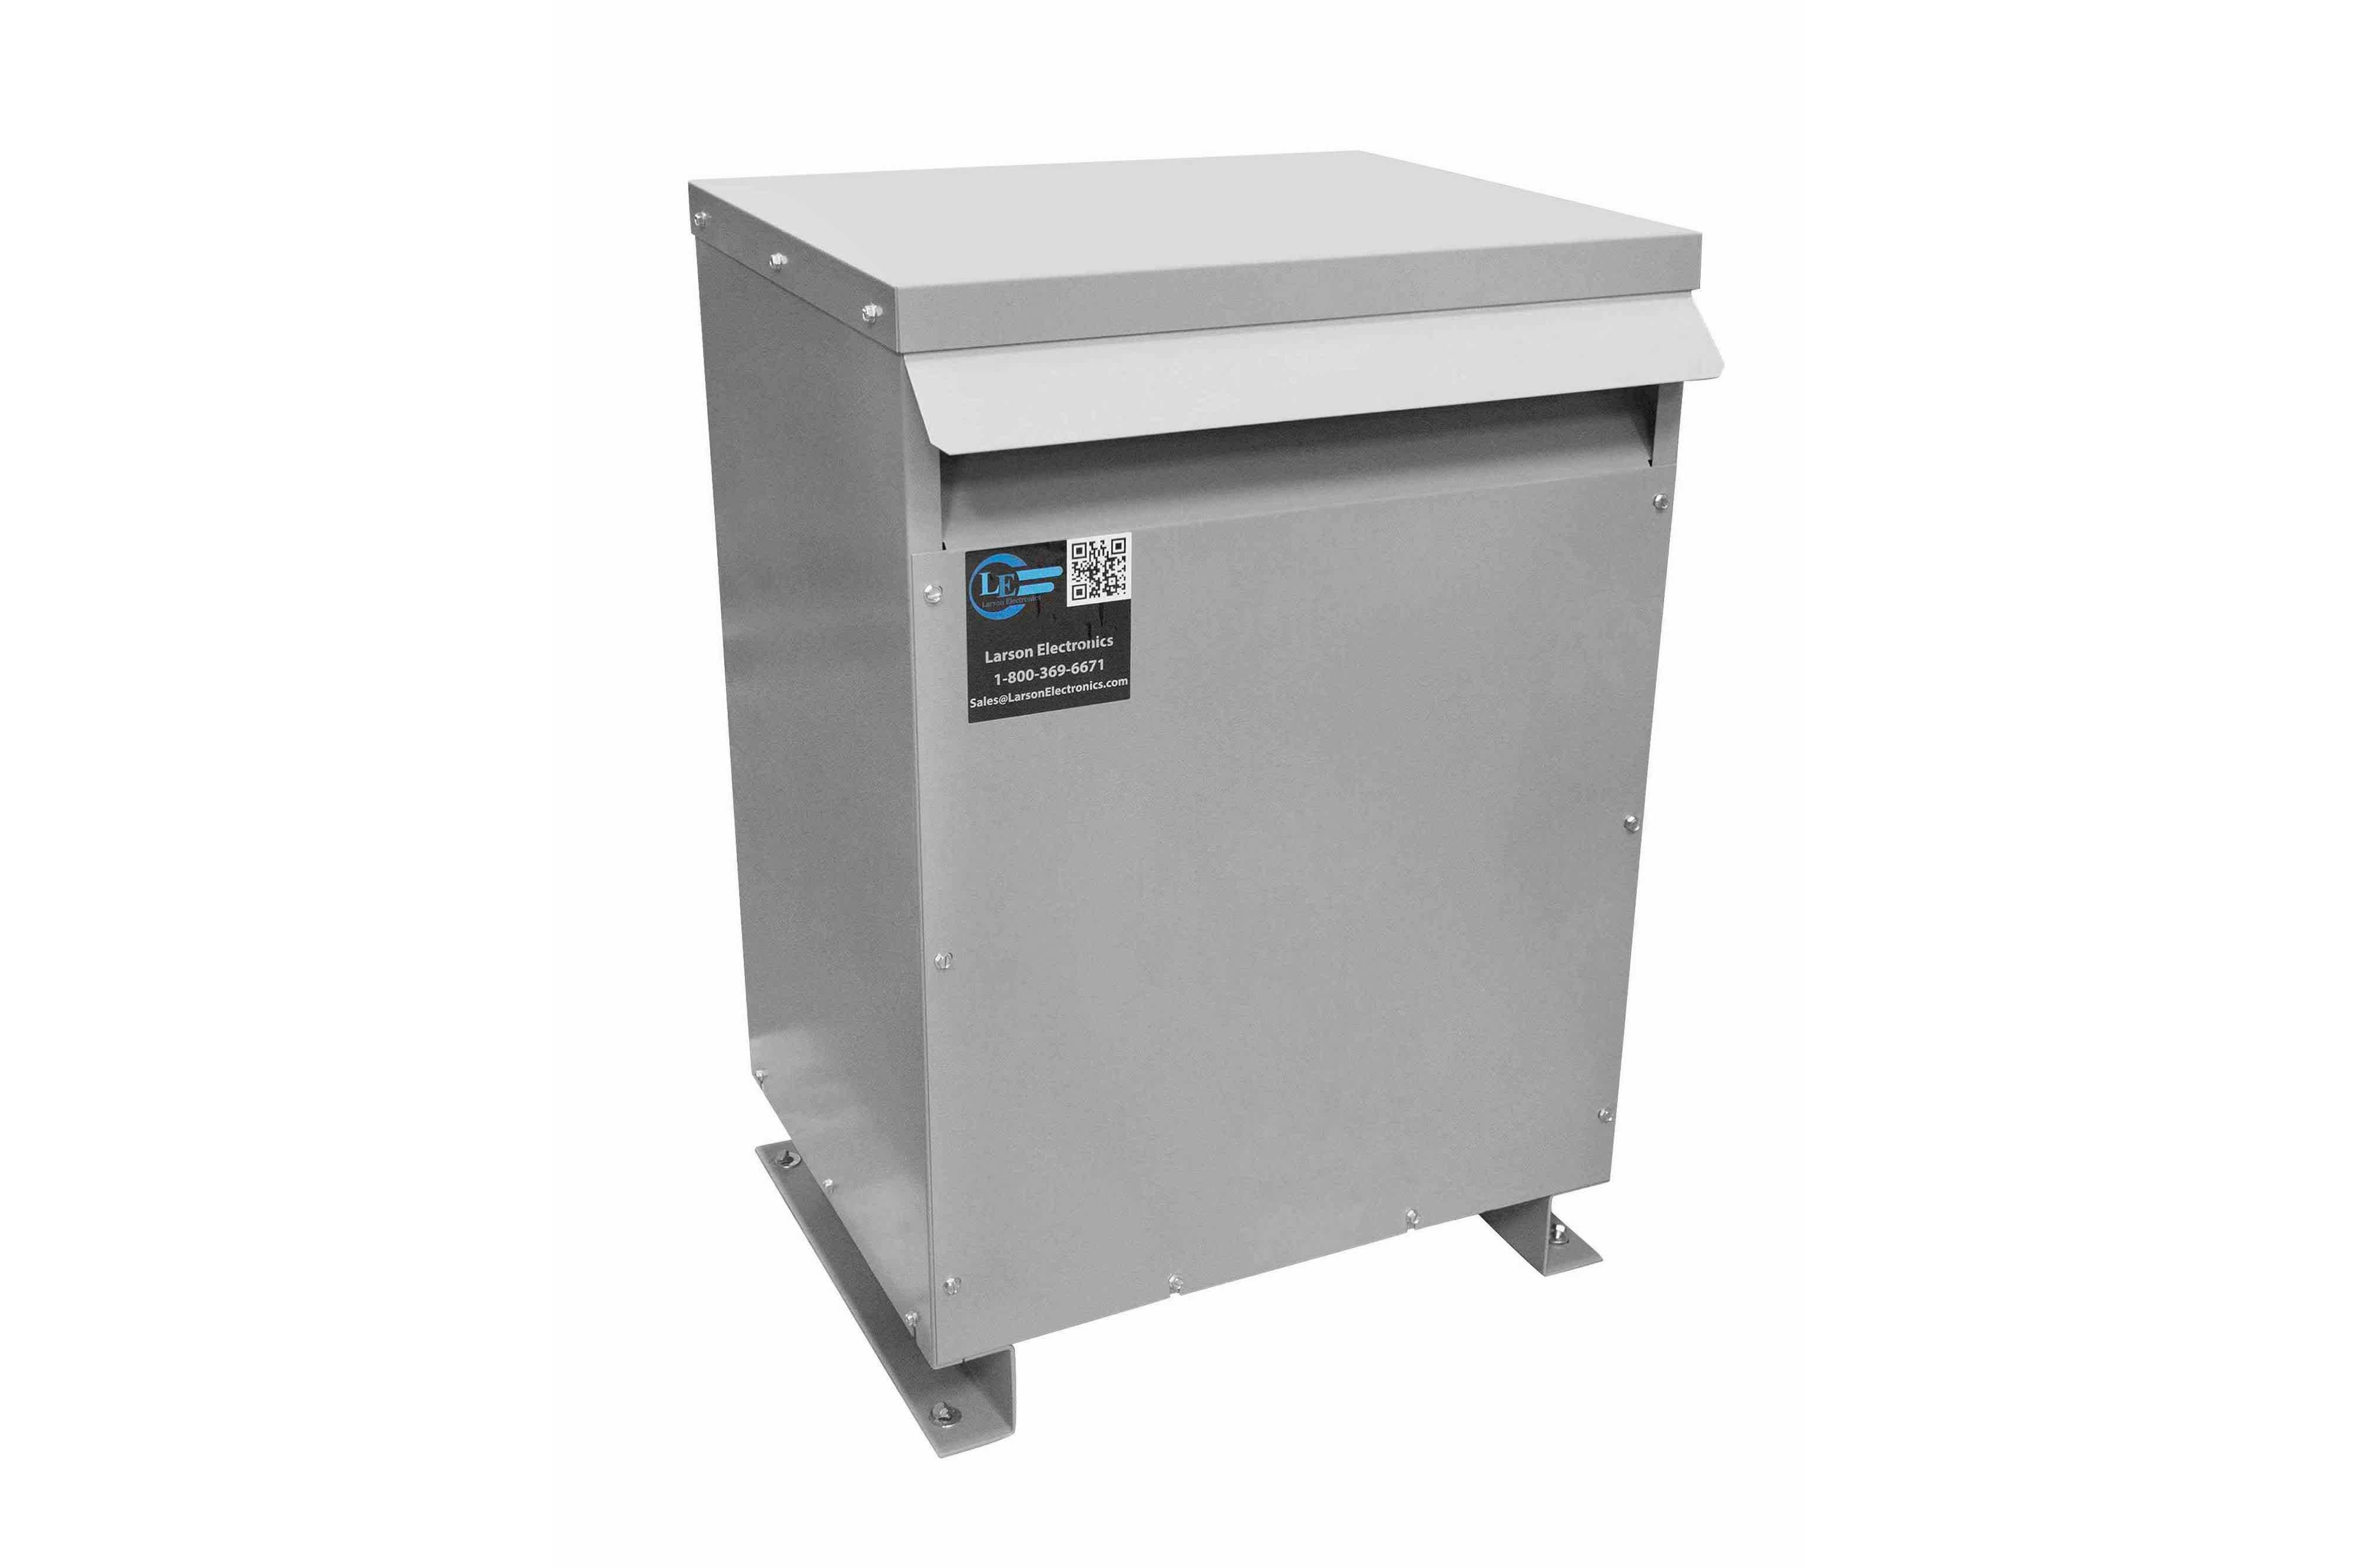 25 kVA 3PH Isolation Transformer, 575V Wye Primary, 240V/120 Delta Secondary, N3R, Ventilated, 60 Hz